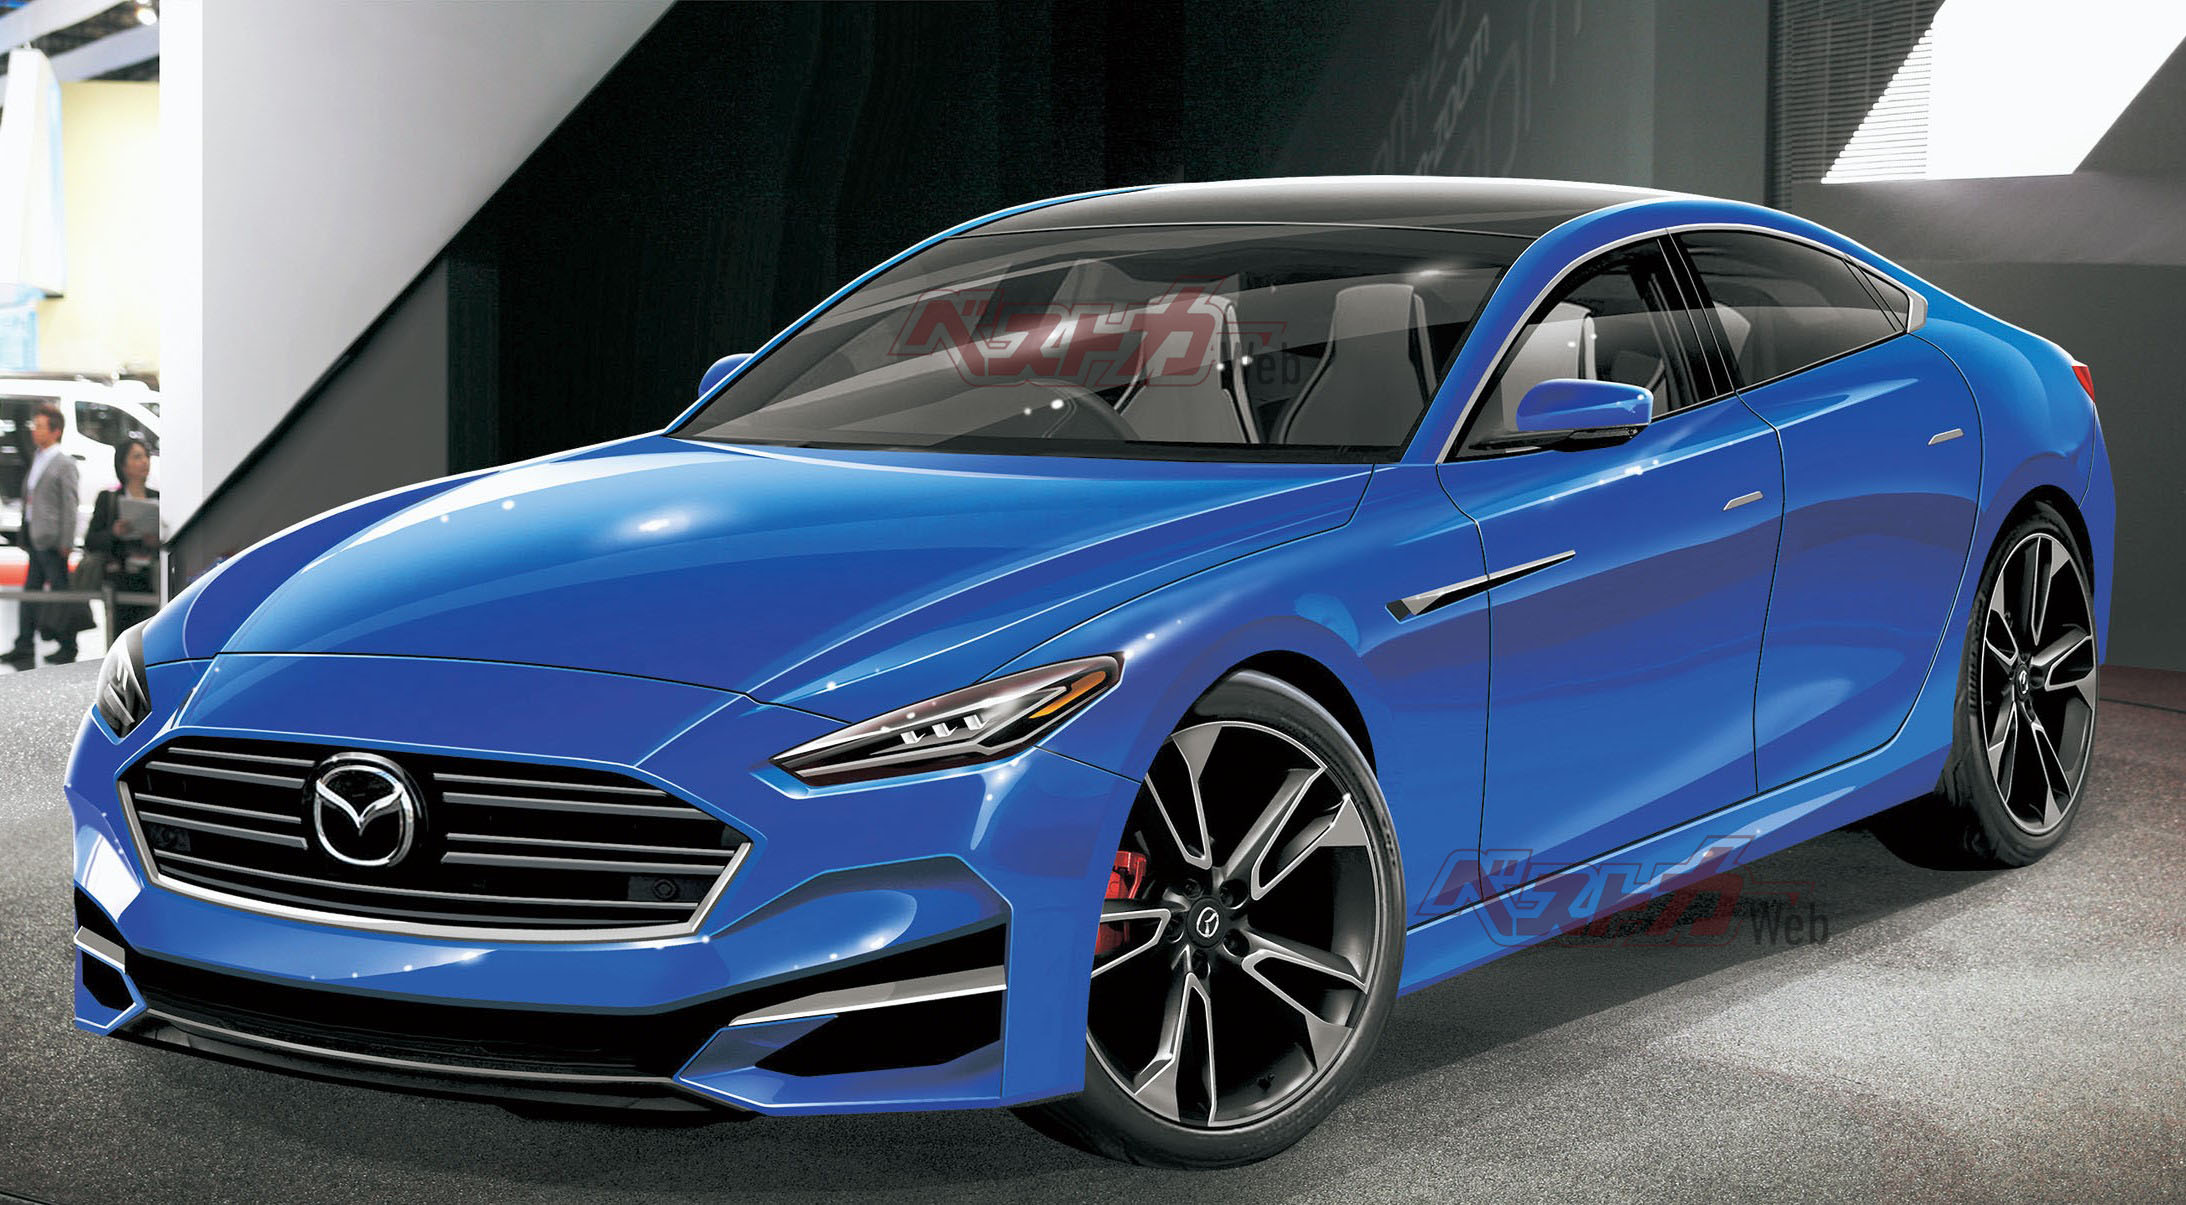 2020 - [Mazda] 6 IV 61498070be53f766c306137ed36e6d54.jpg?_ga=2.223274588.670652924.1567247004-1526316194